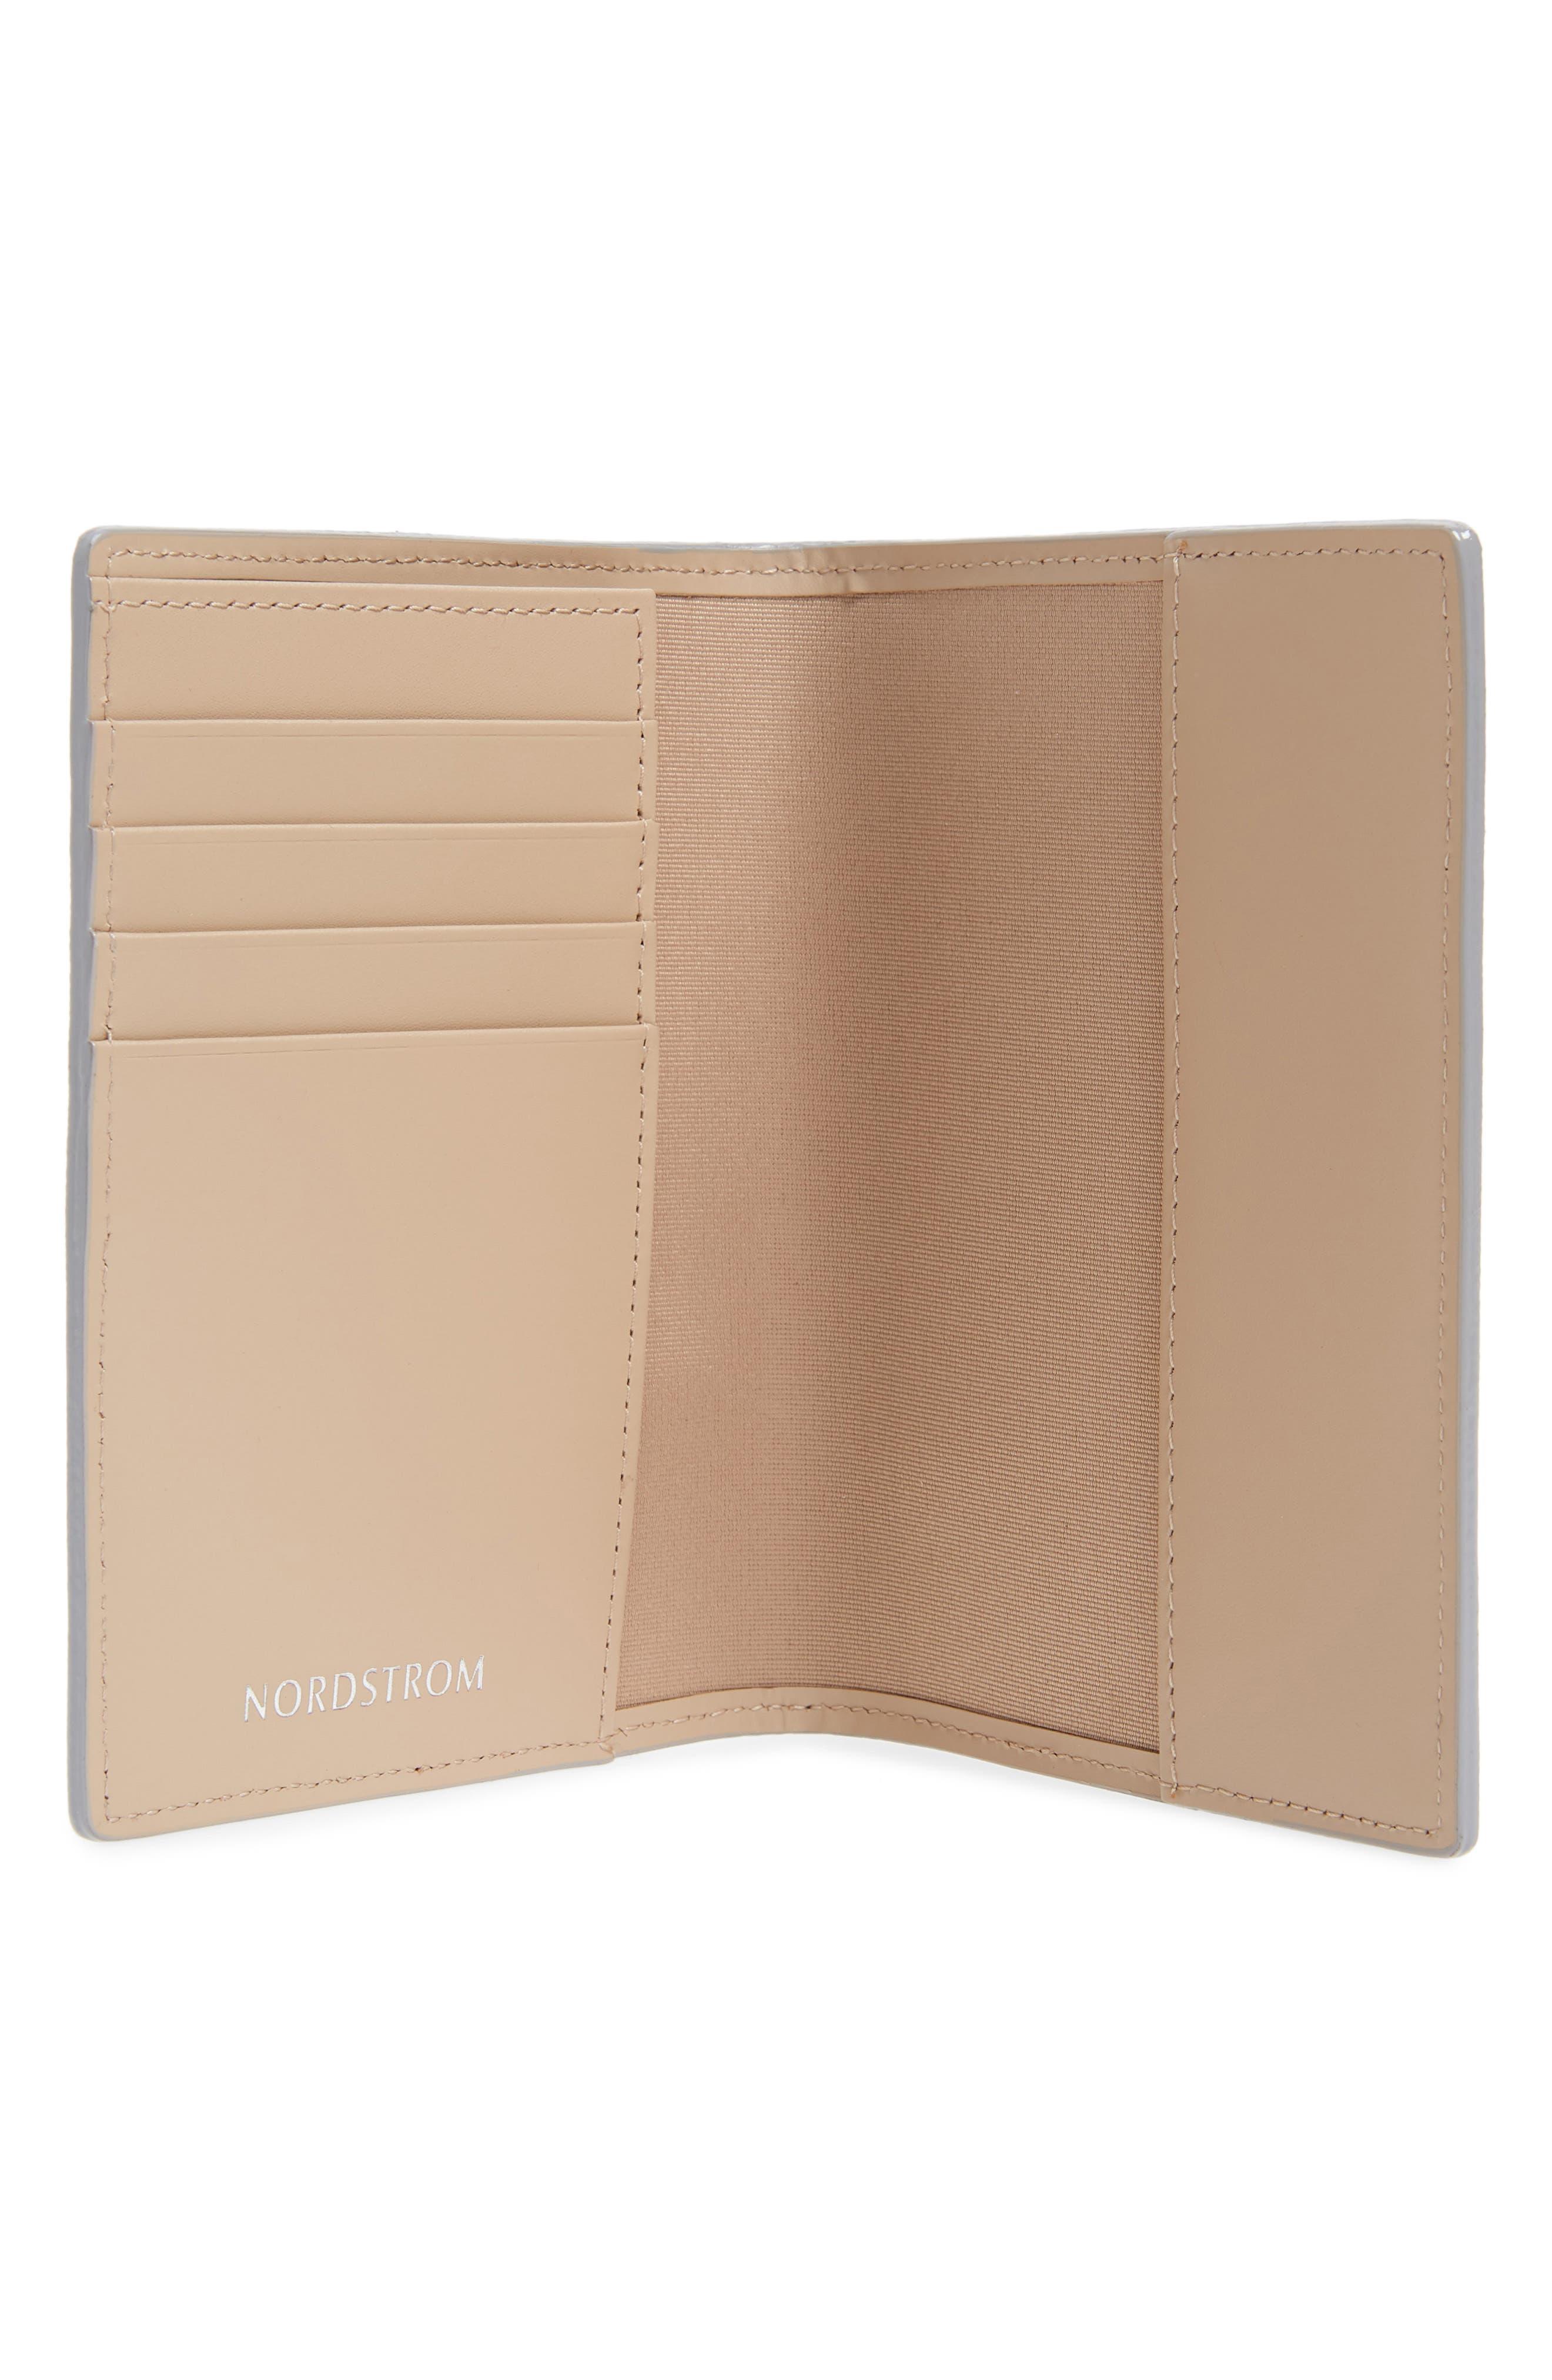 Leather Passport Case,                             Alternate thumbnail 11, color,